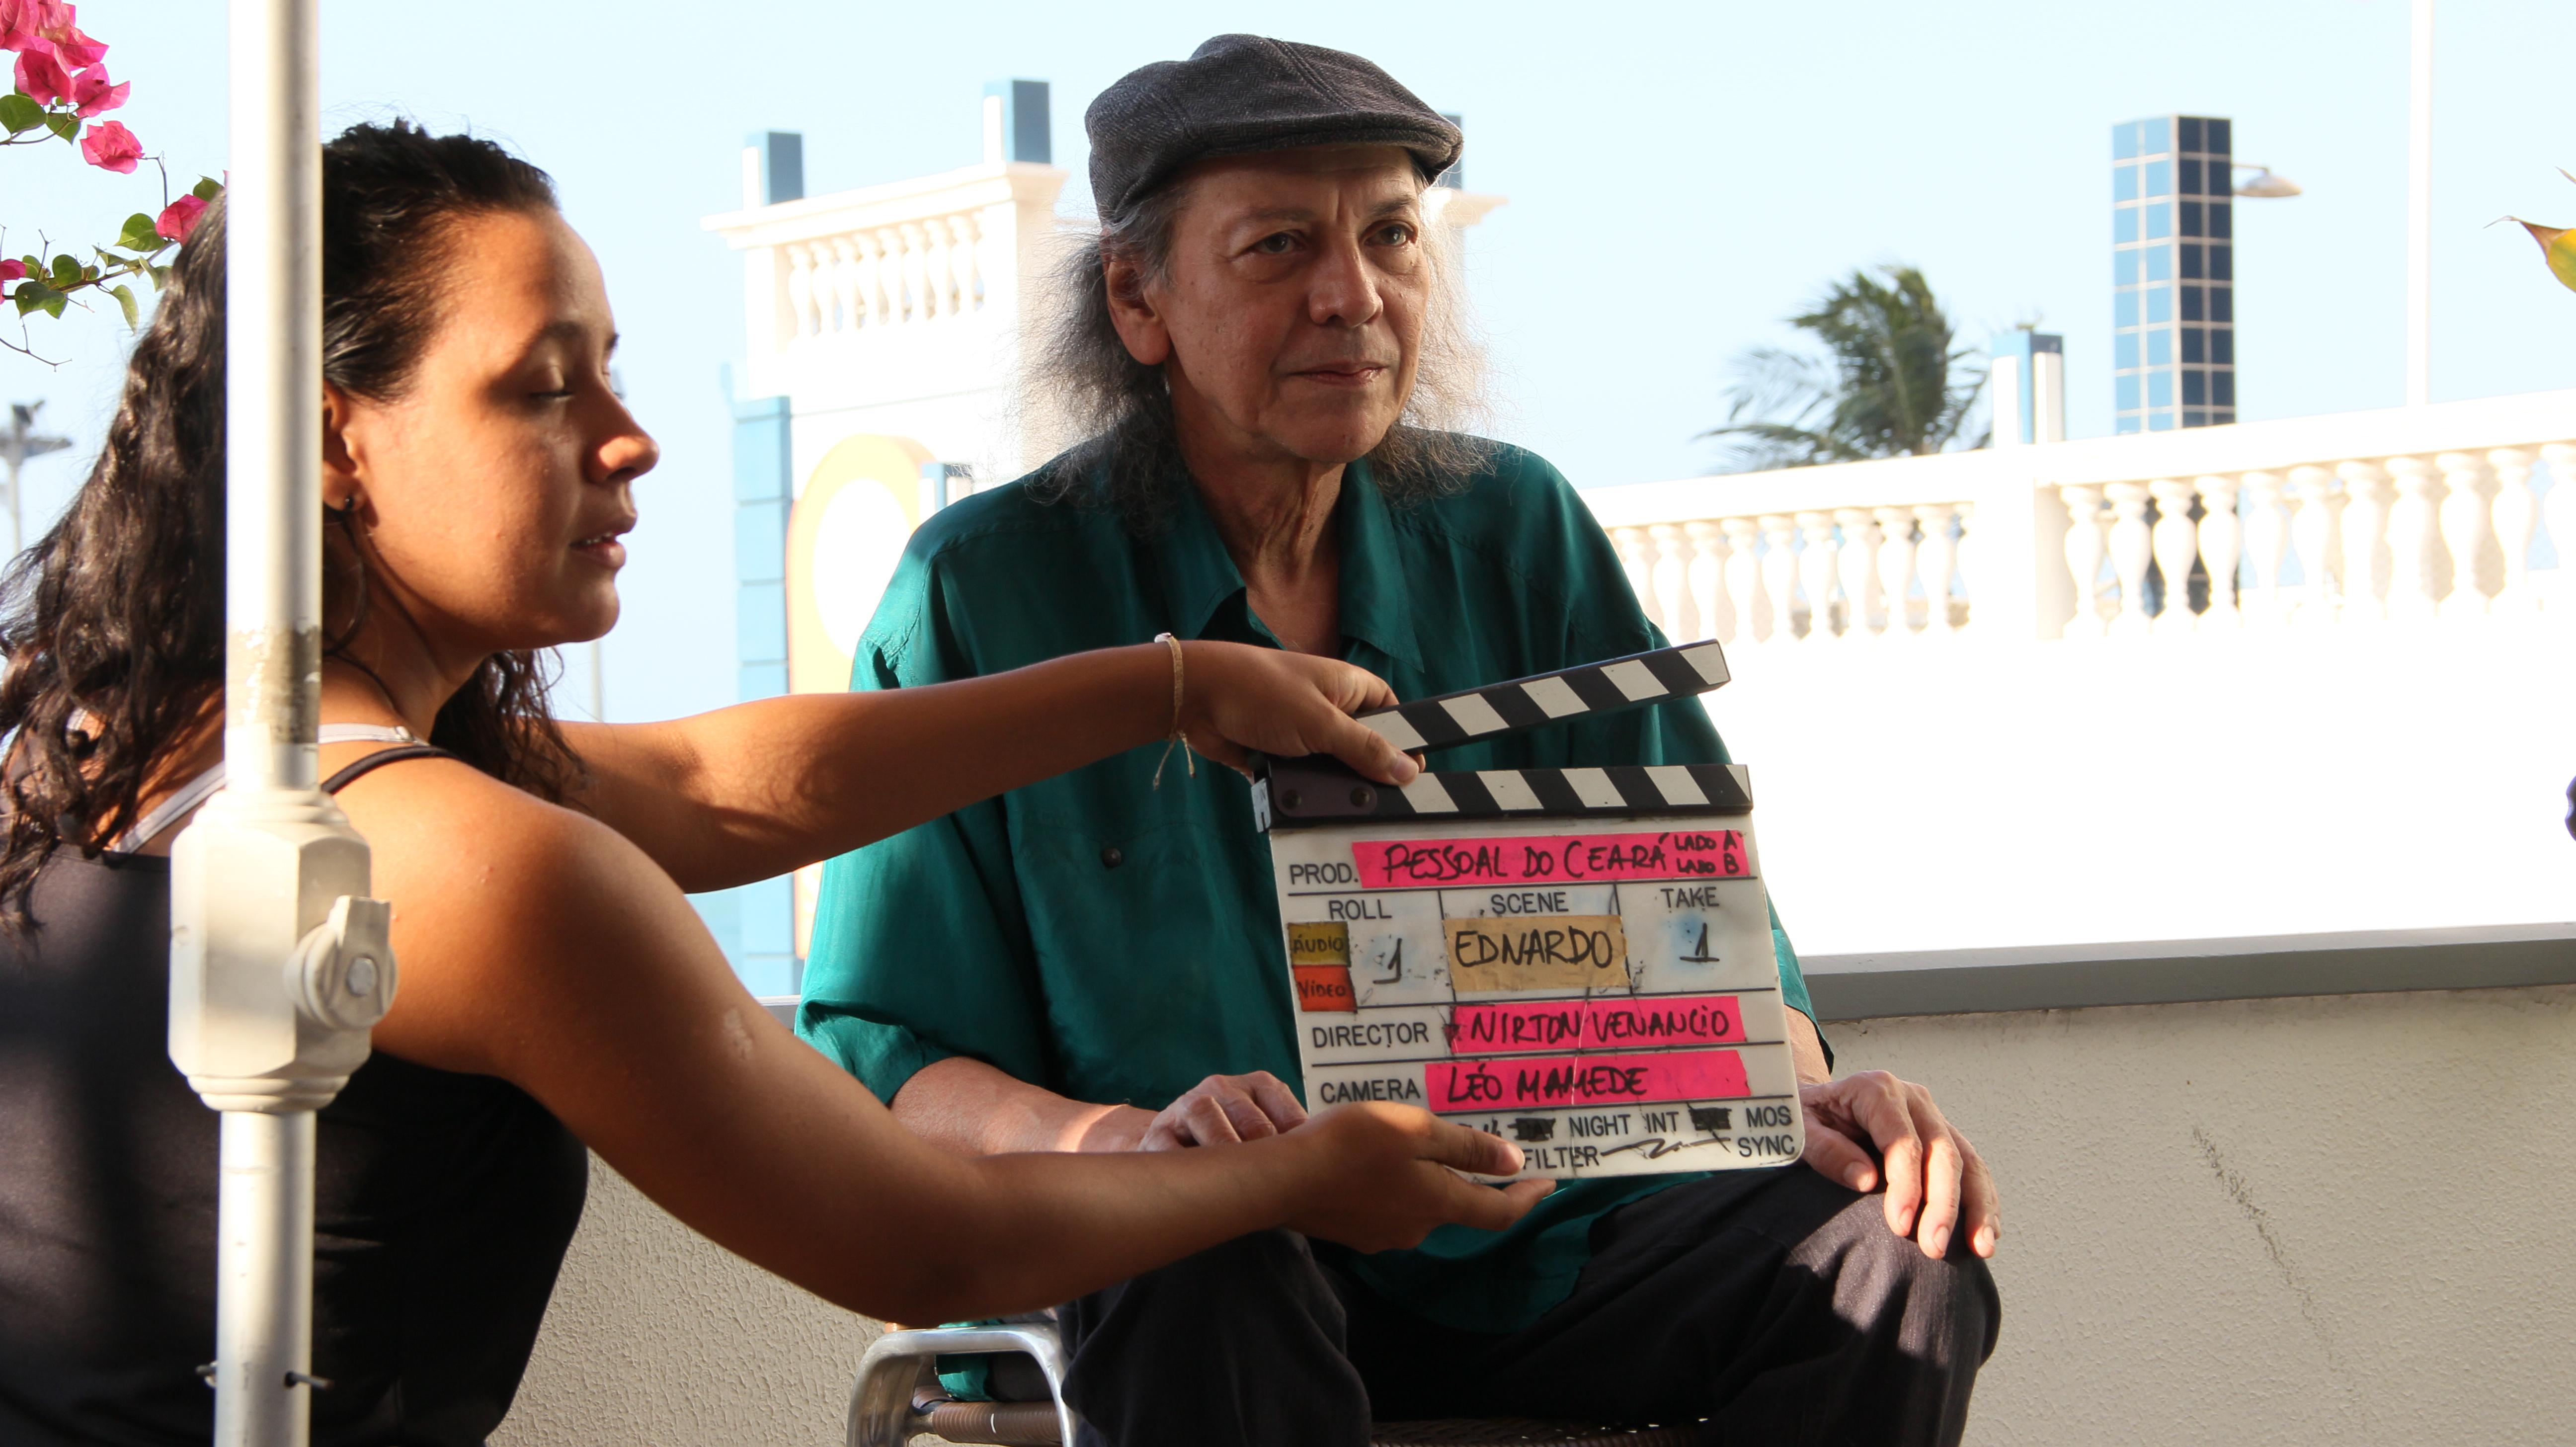 Nirton Venâncio - entrevista com Ednardo